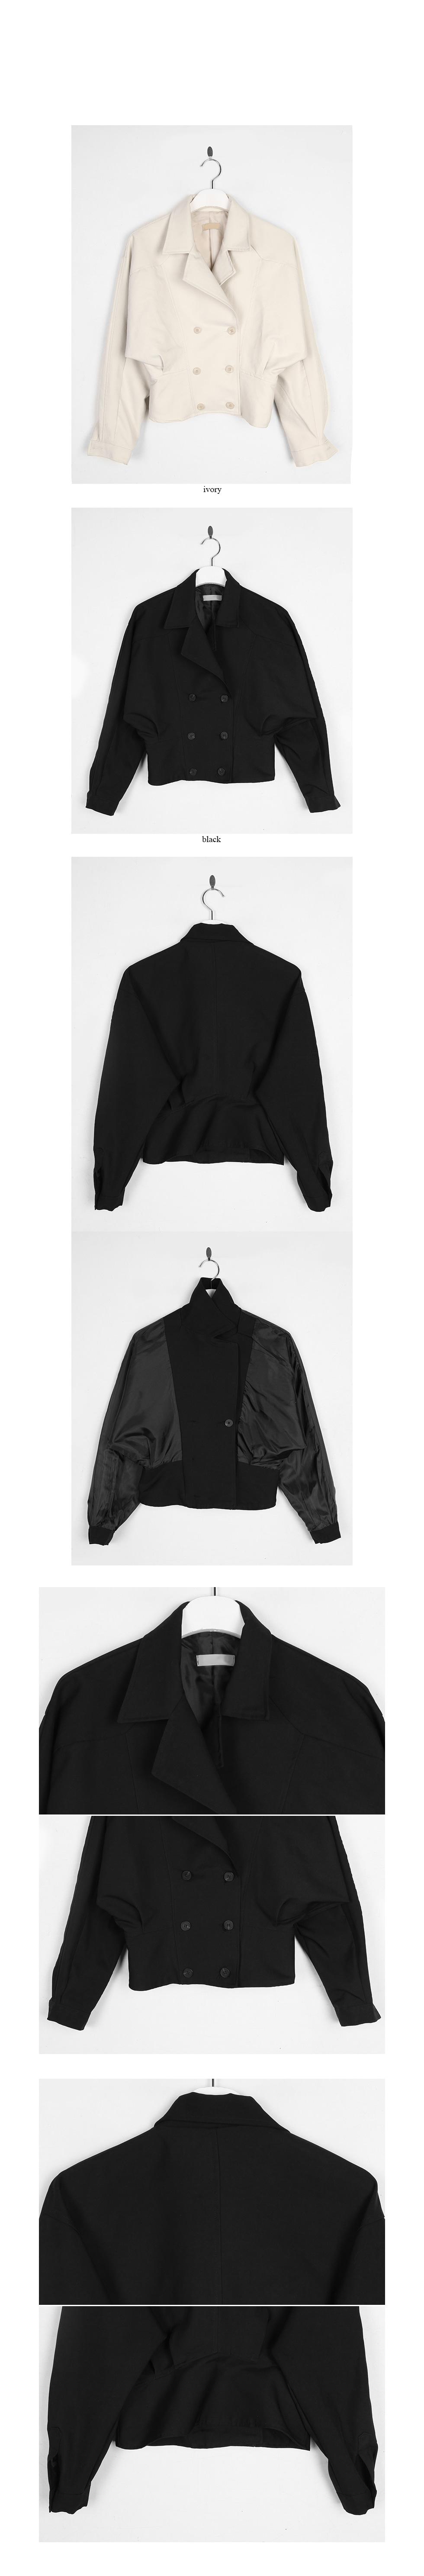 bat-wing double short jacket